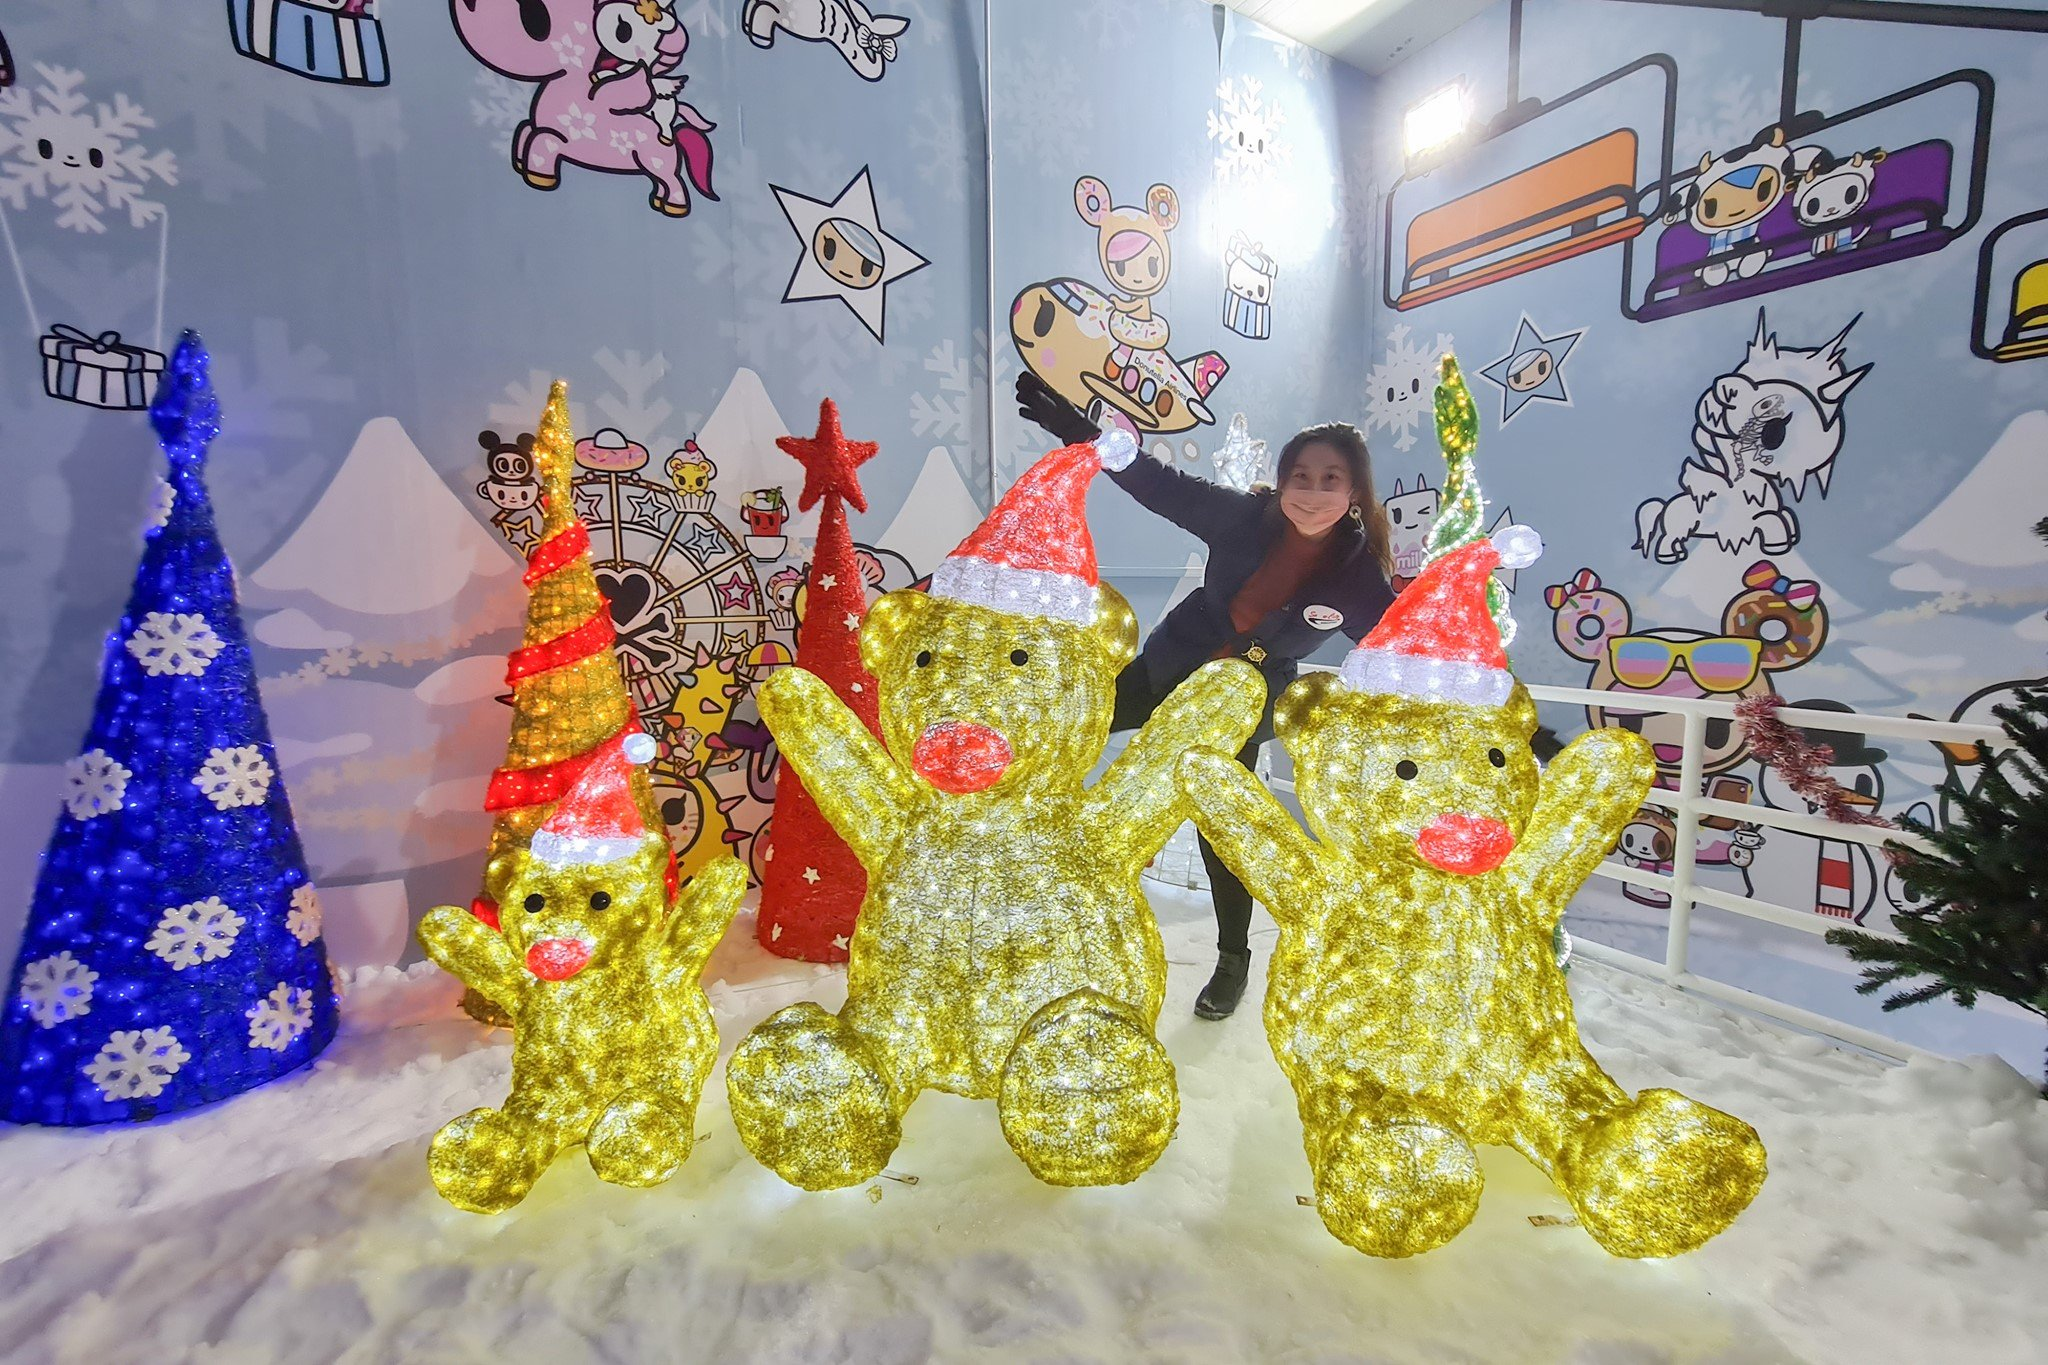 Changi festive village